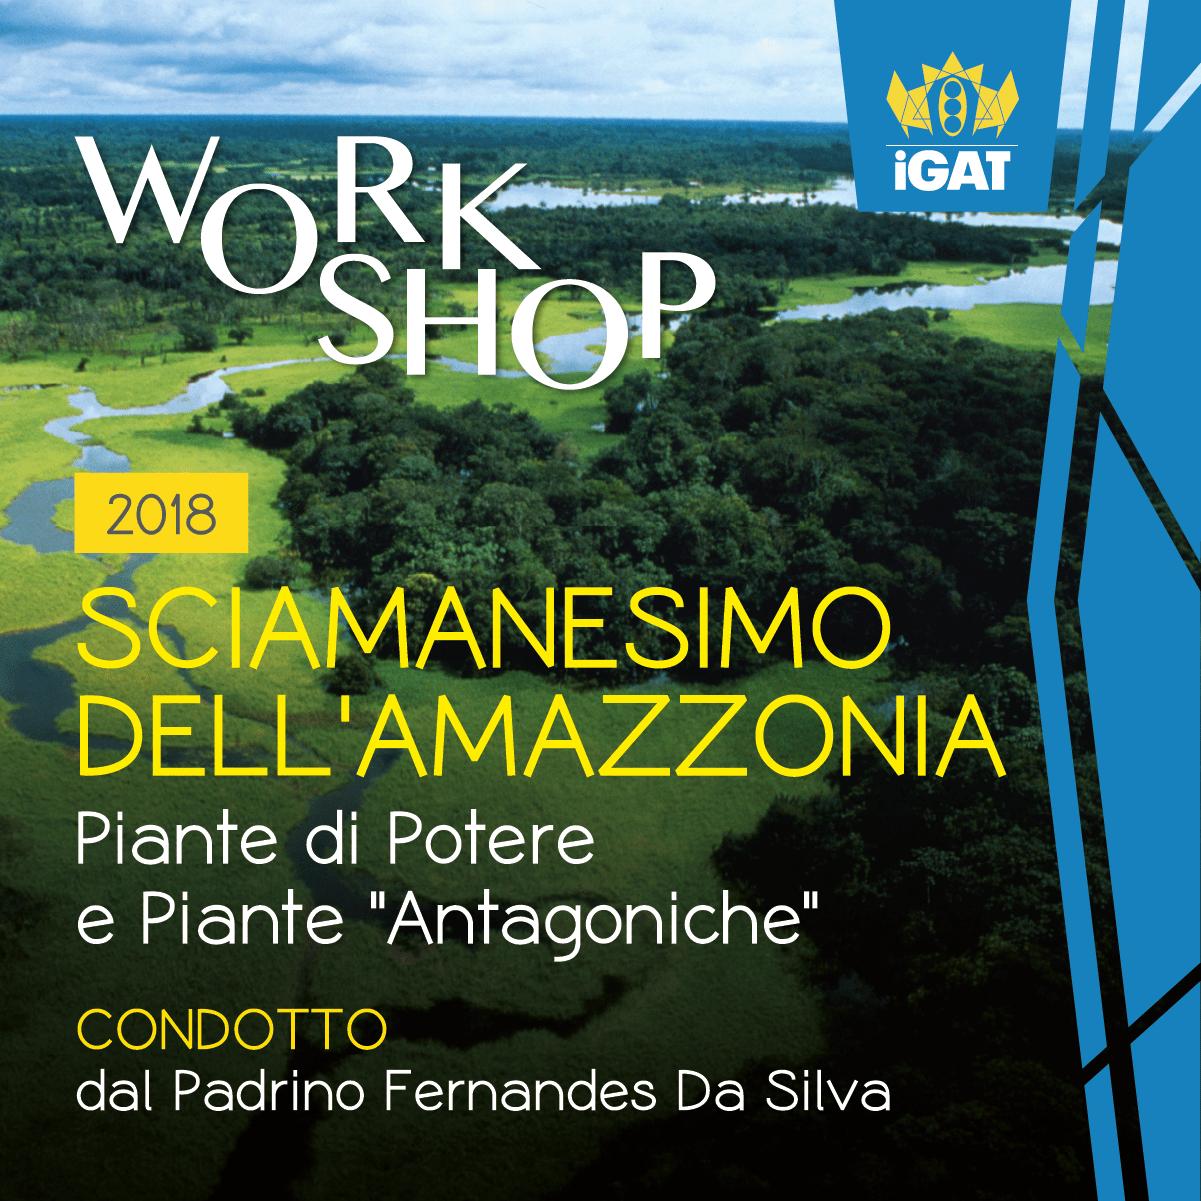 Img Sciamanesimo Workshop 2018-min